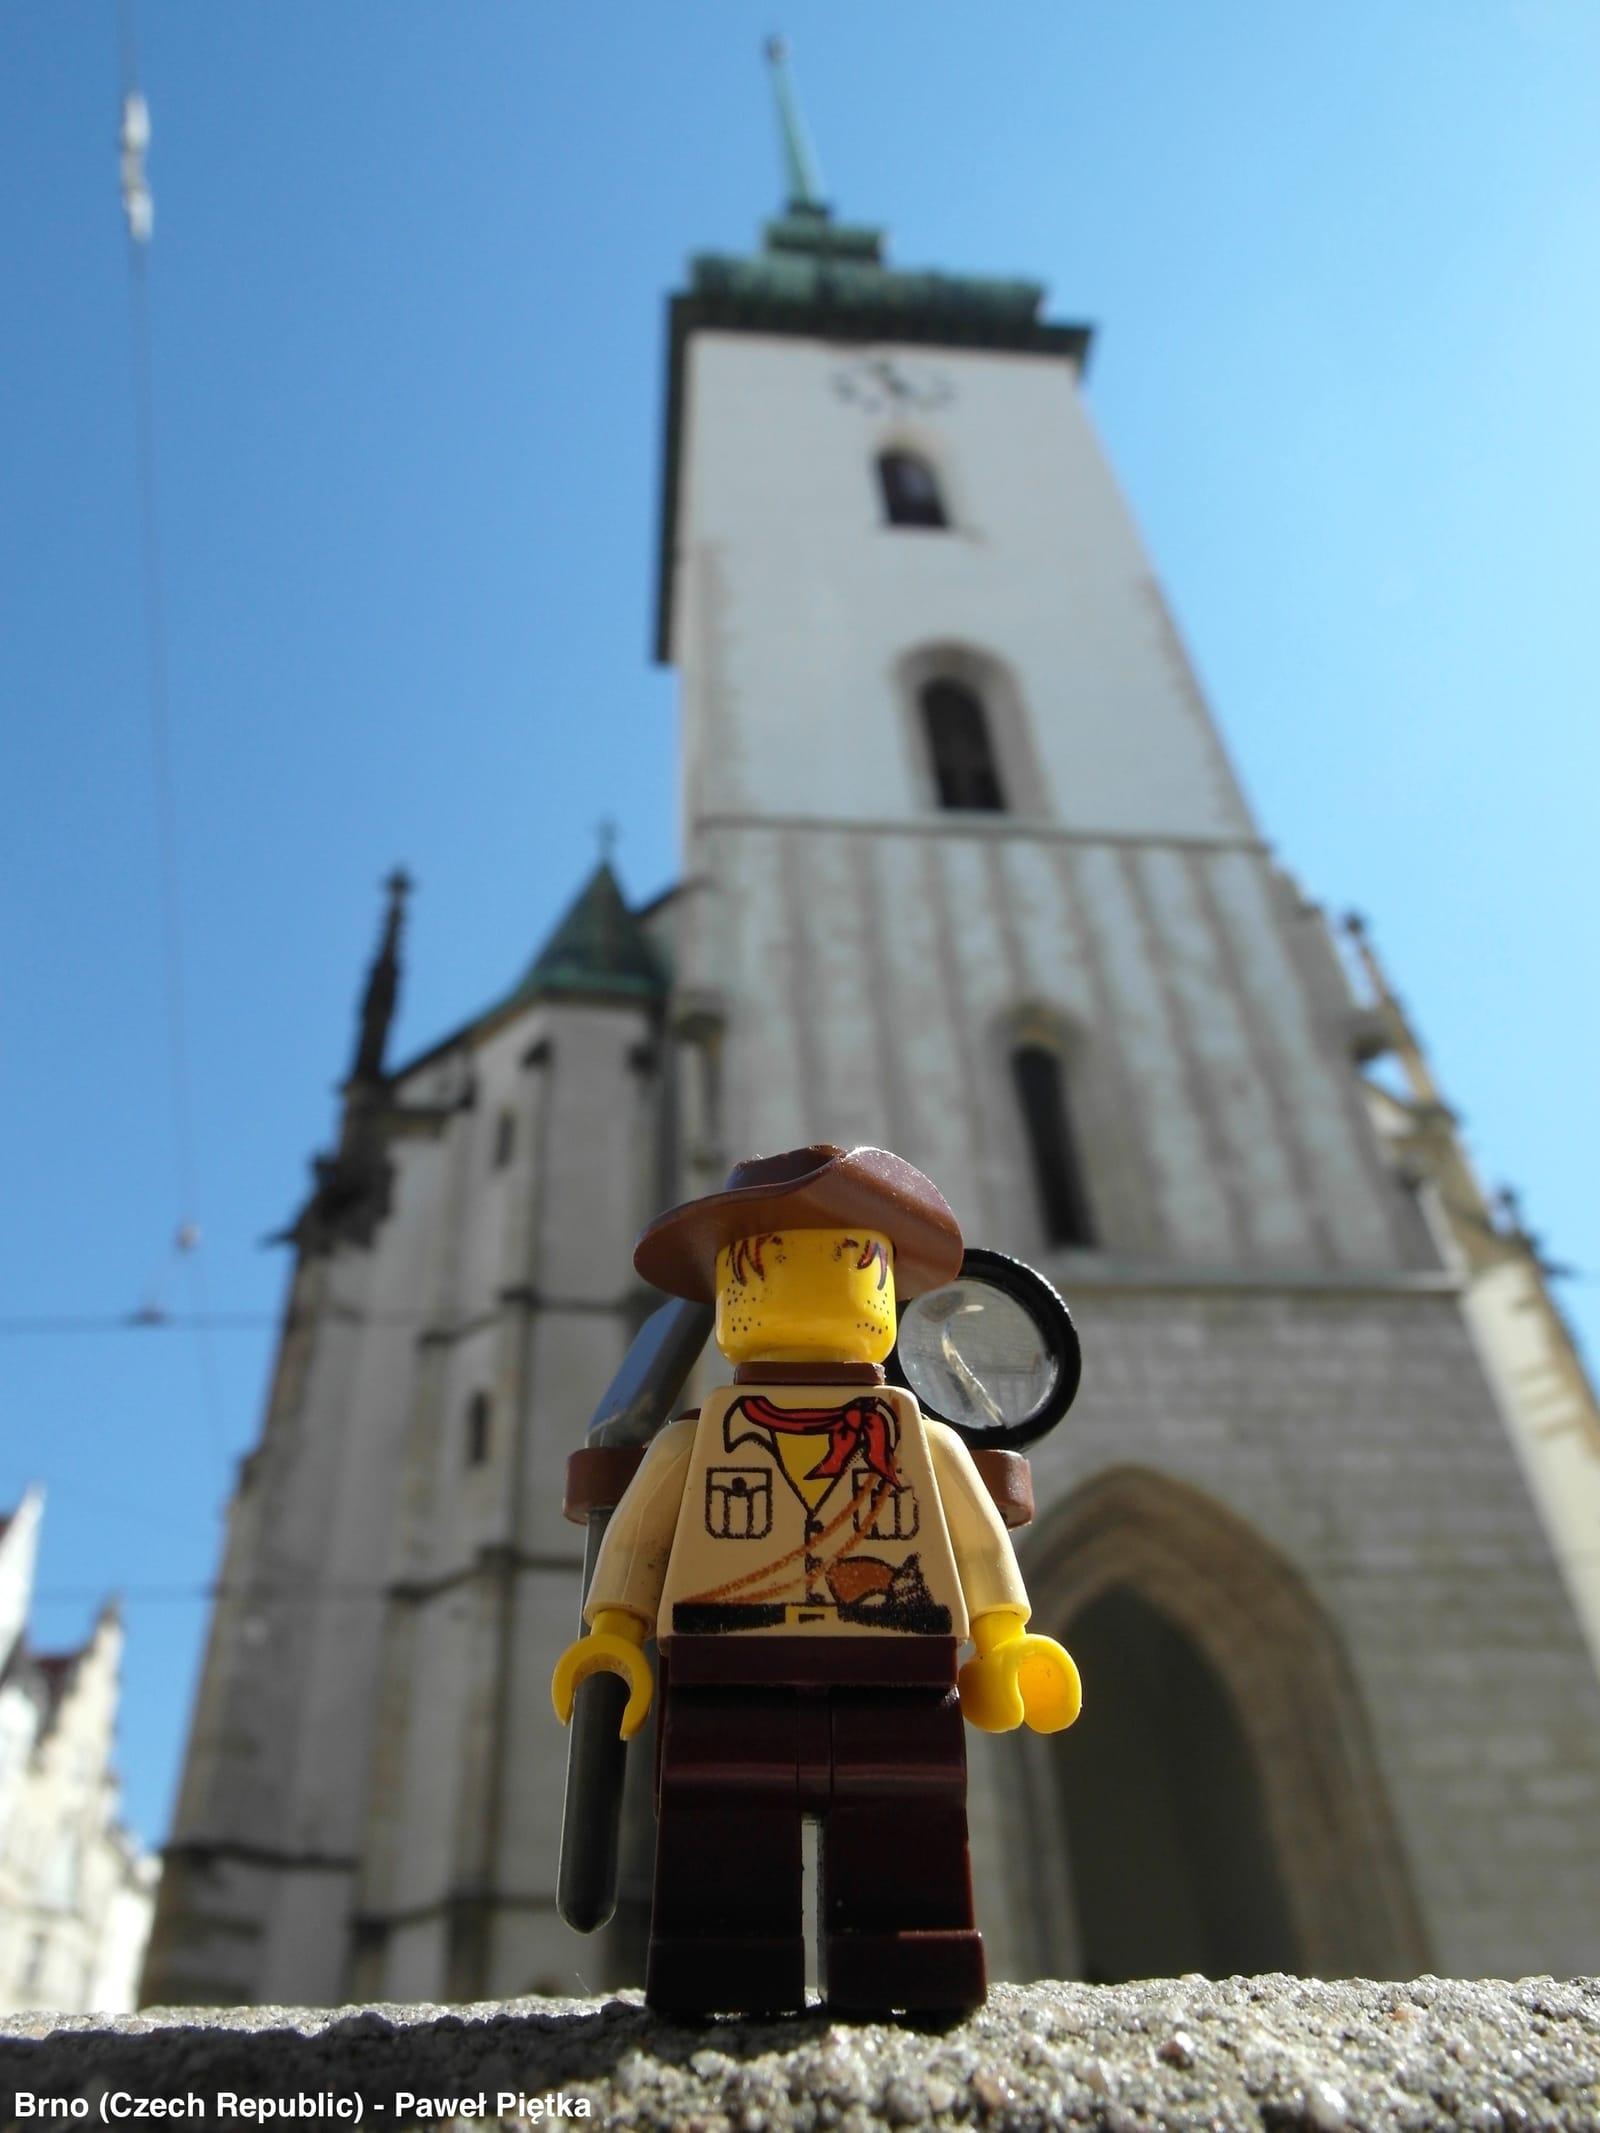 Brno (Czech Republic) - Church of St James